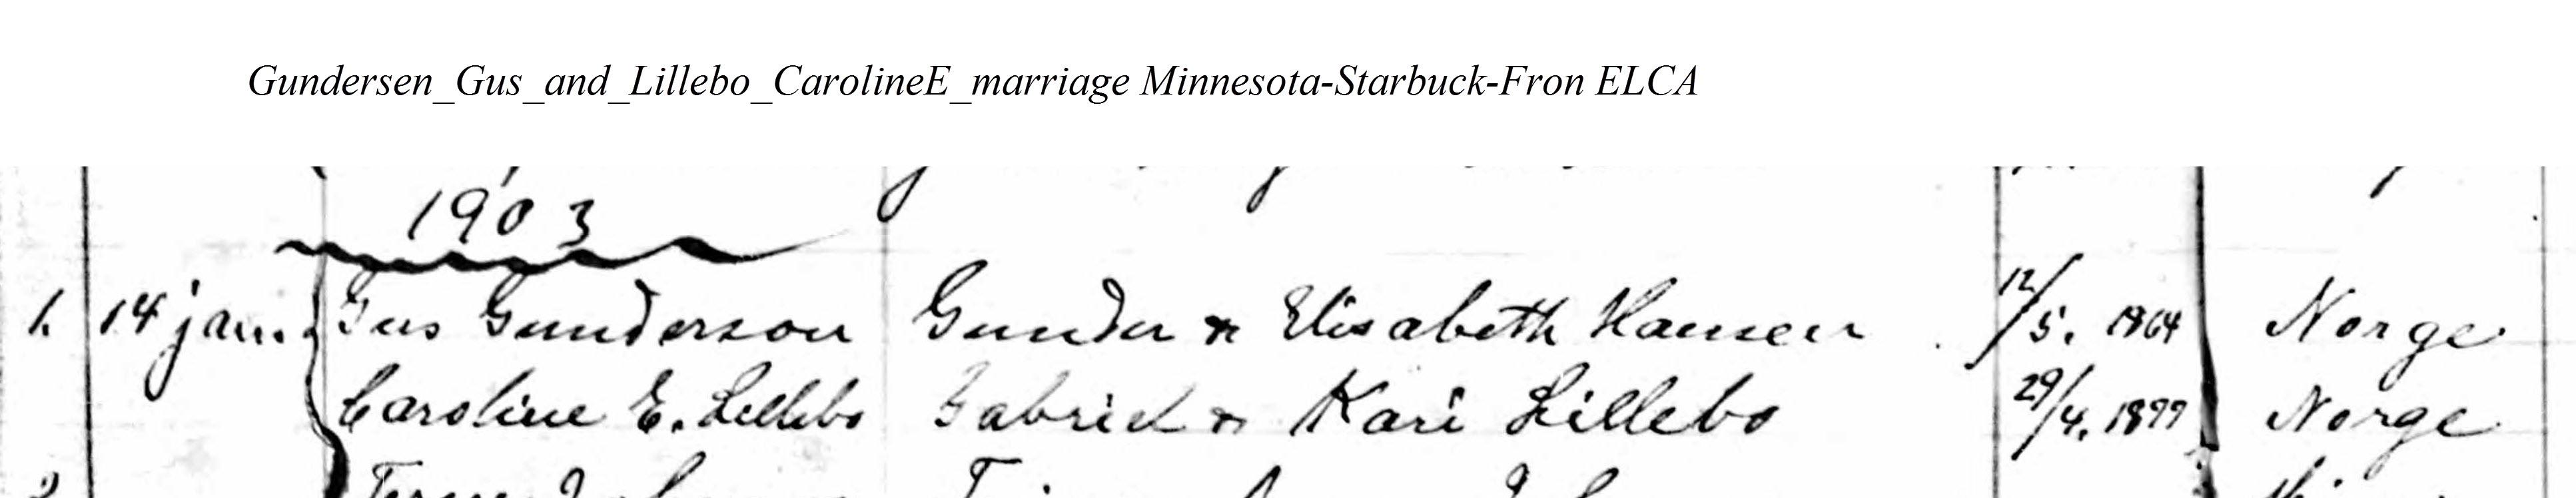 Gundersen_Gus_and_Lillebo_CarolineE_marriage Minnesota-Starbuck-Fron ELCA - Ancestry